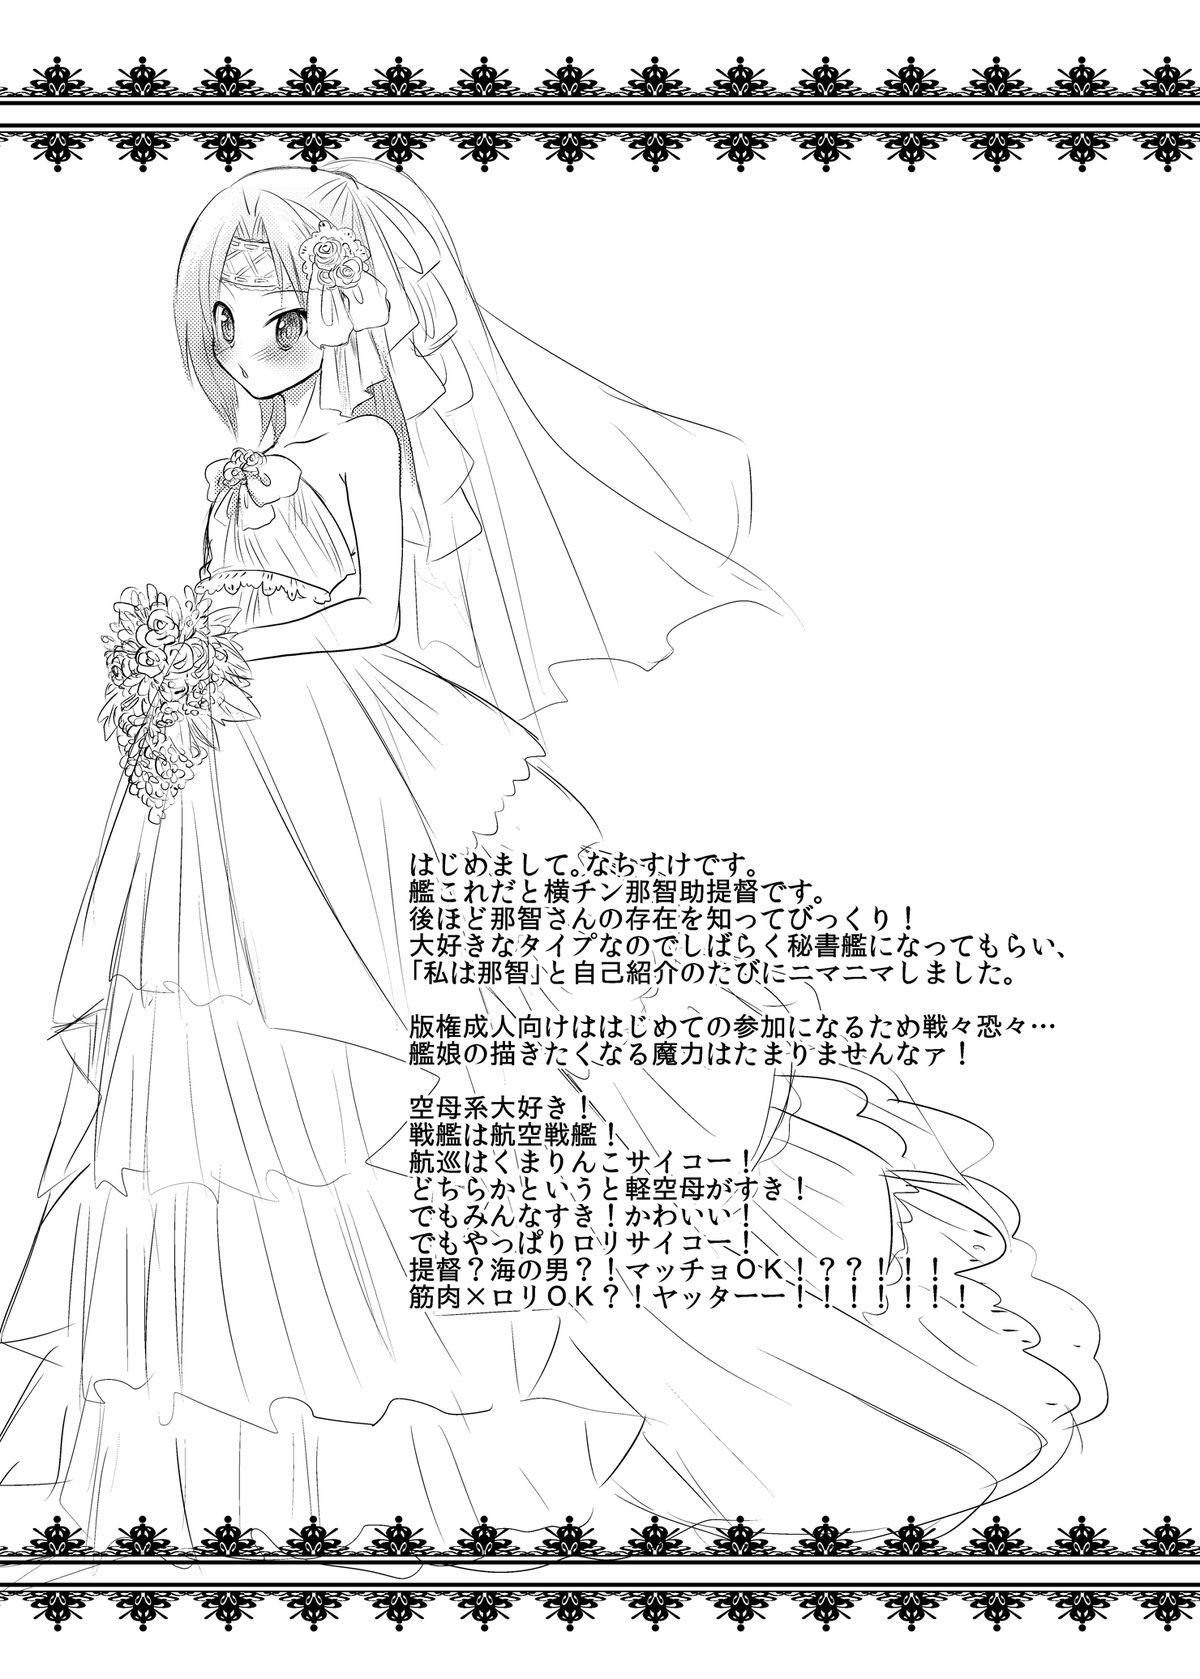 Zuihou-chan wo Kowareru Hodo Dakishimetai 22